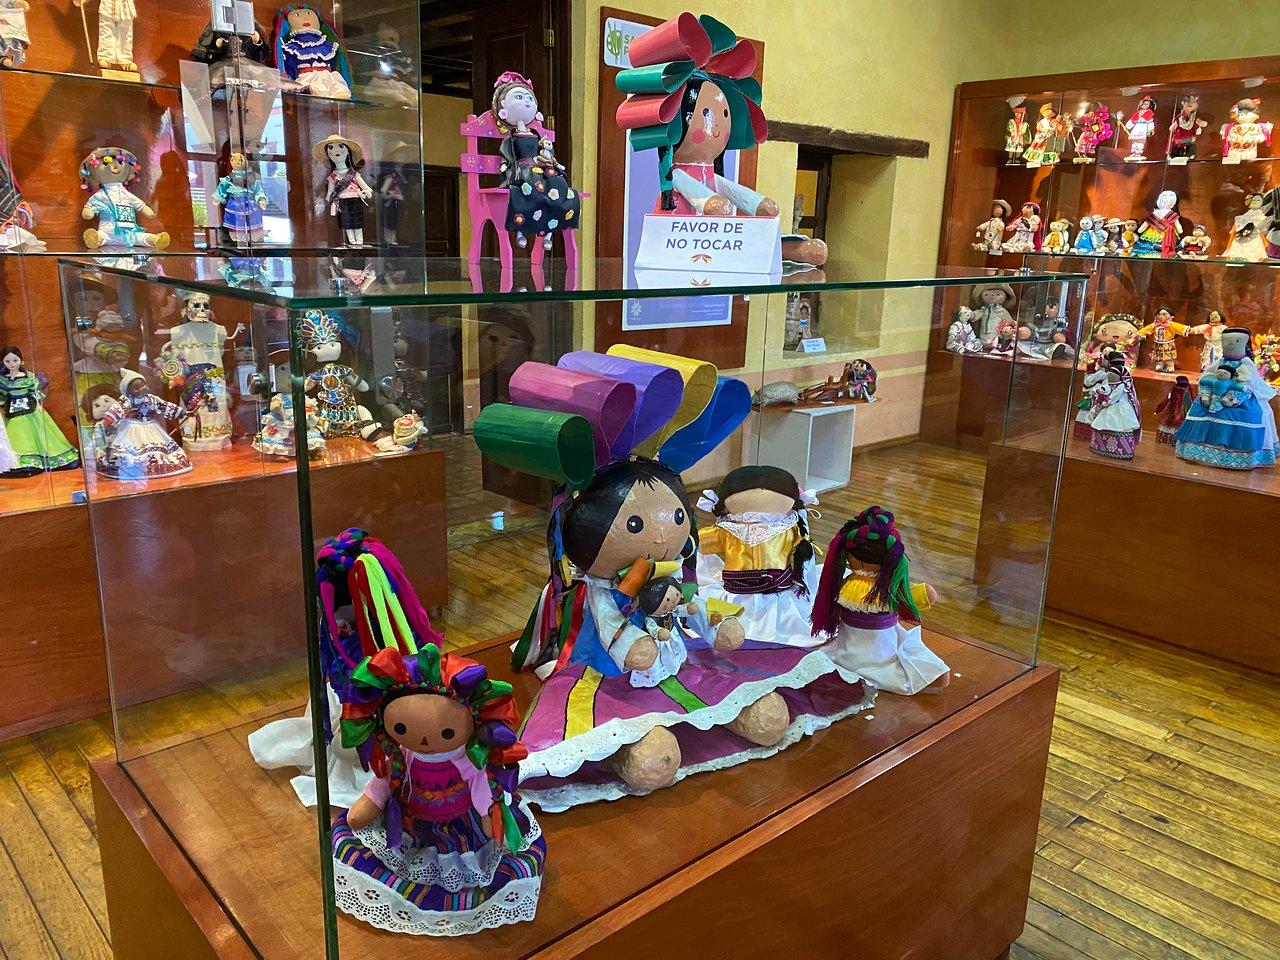 interior del museo de la muñeca artesanal